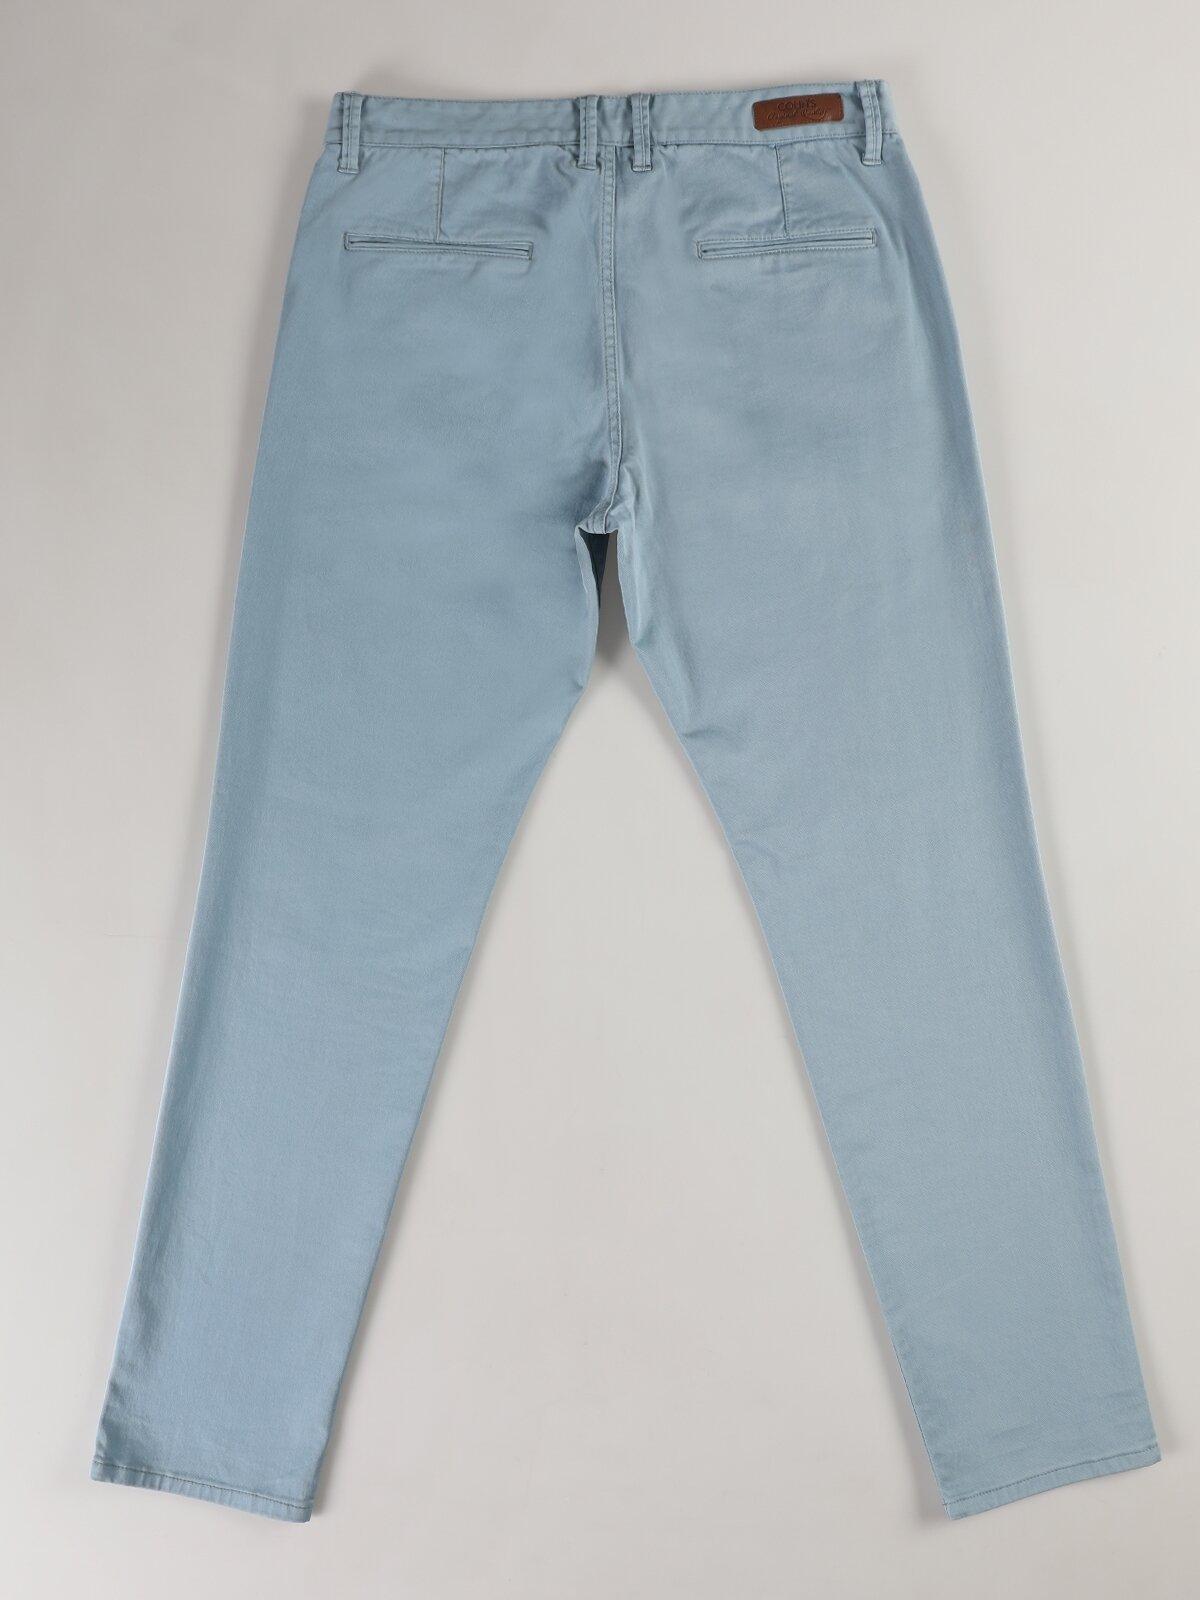 Slim Fit Düz Paça Yüksek Bel Açık Mavi Erkek Pantolon